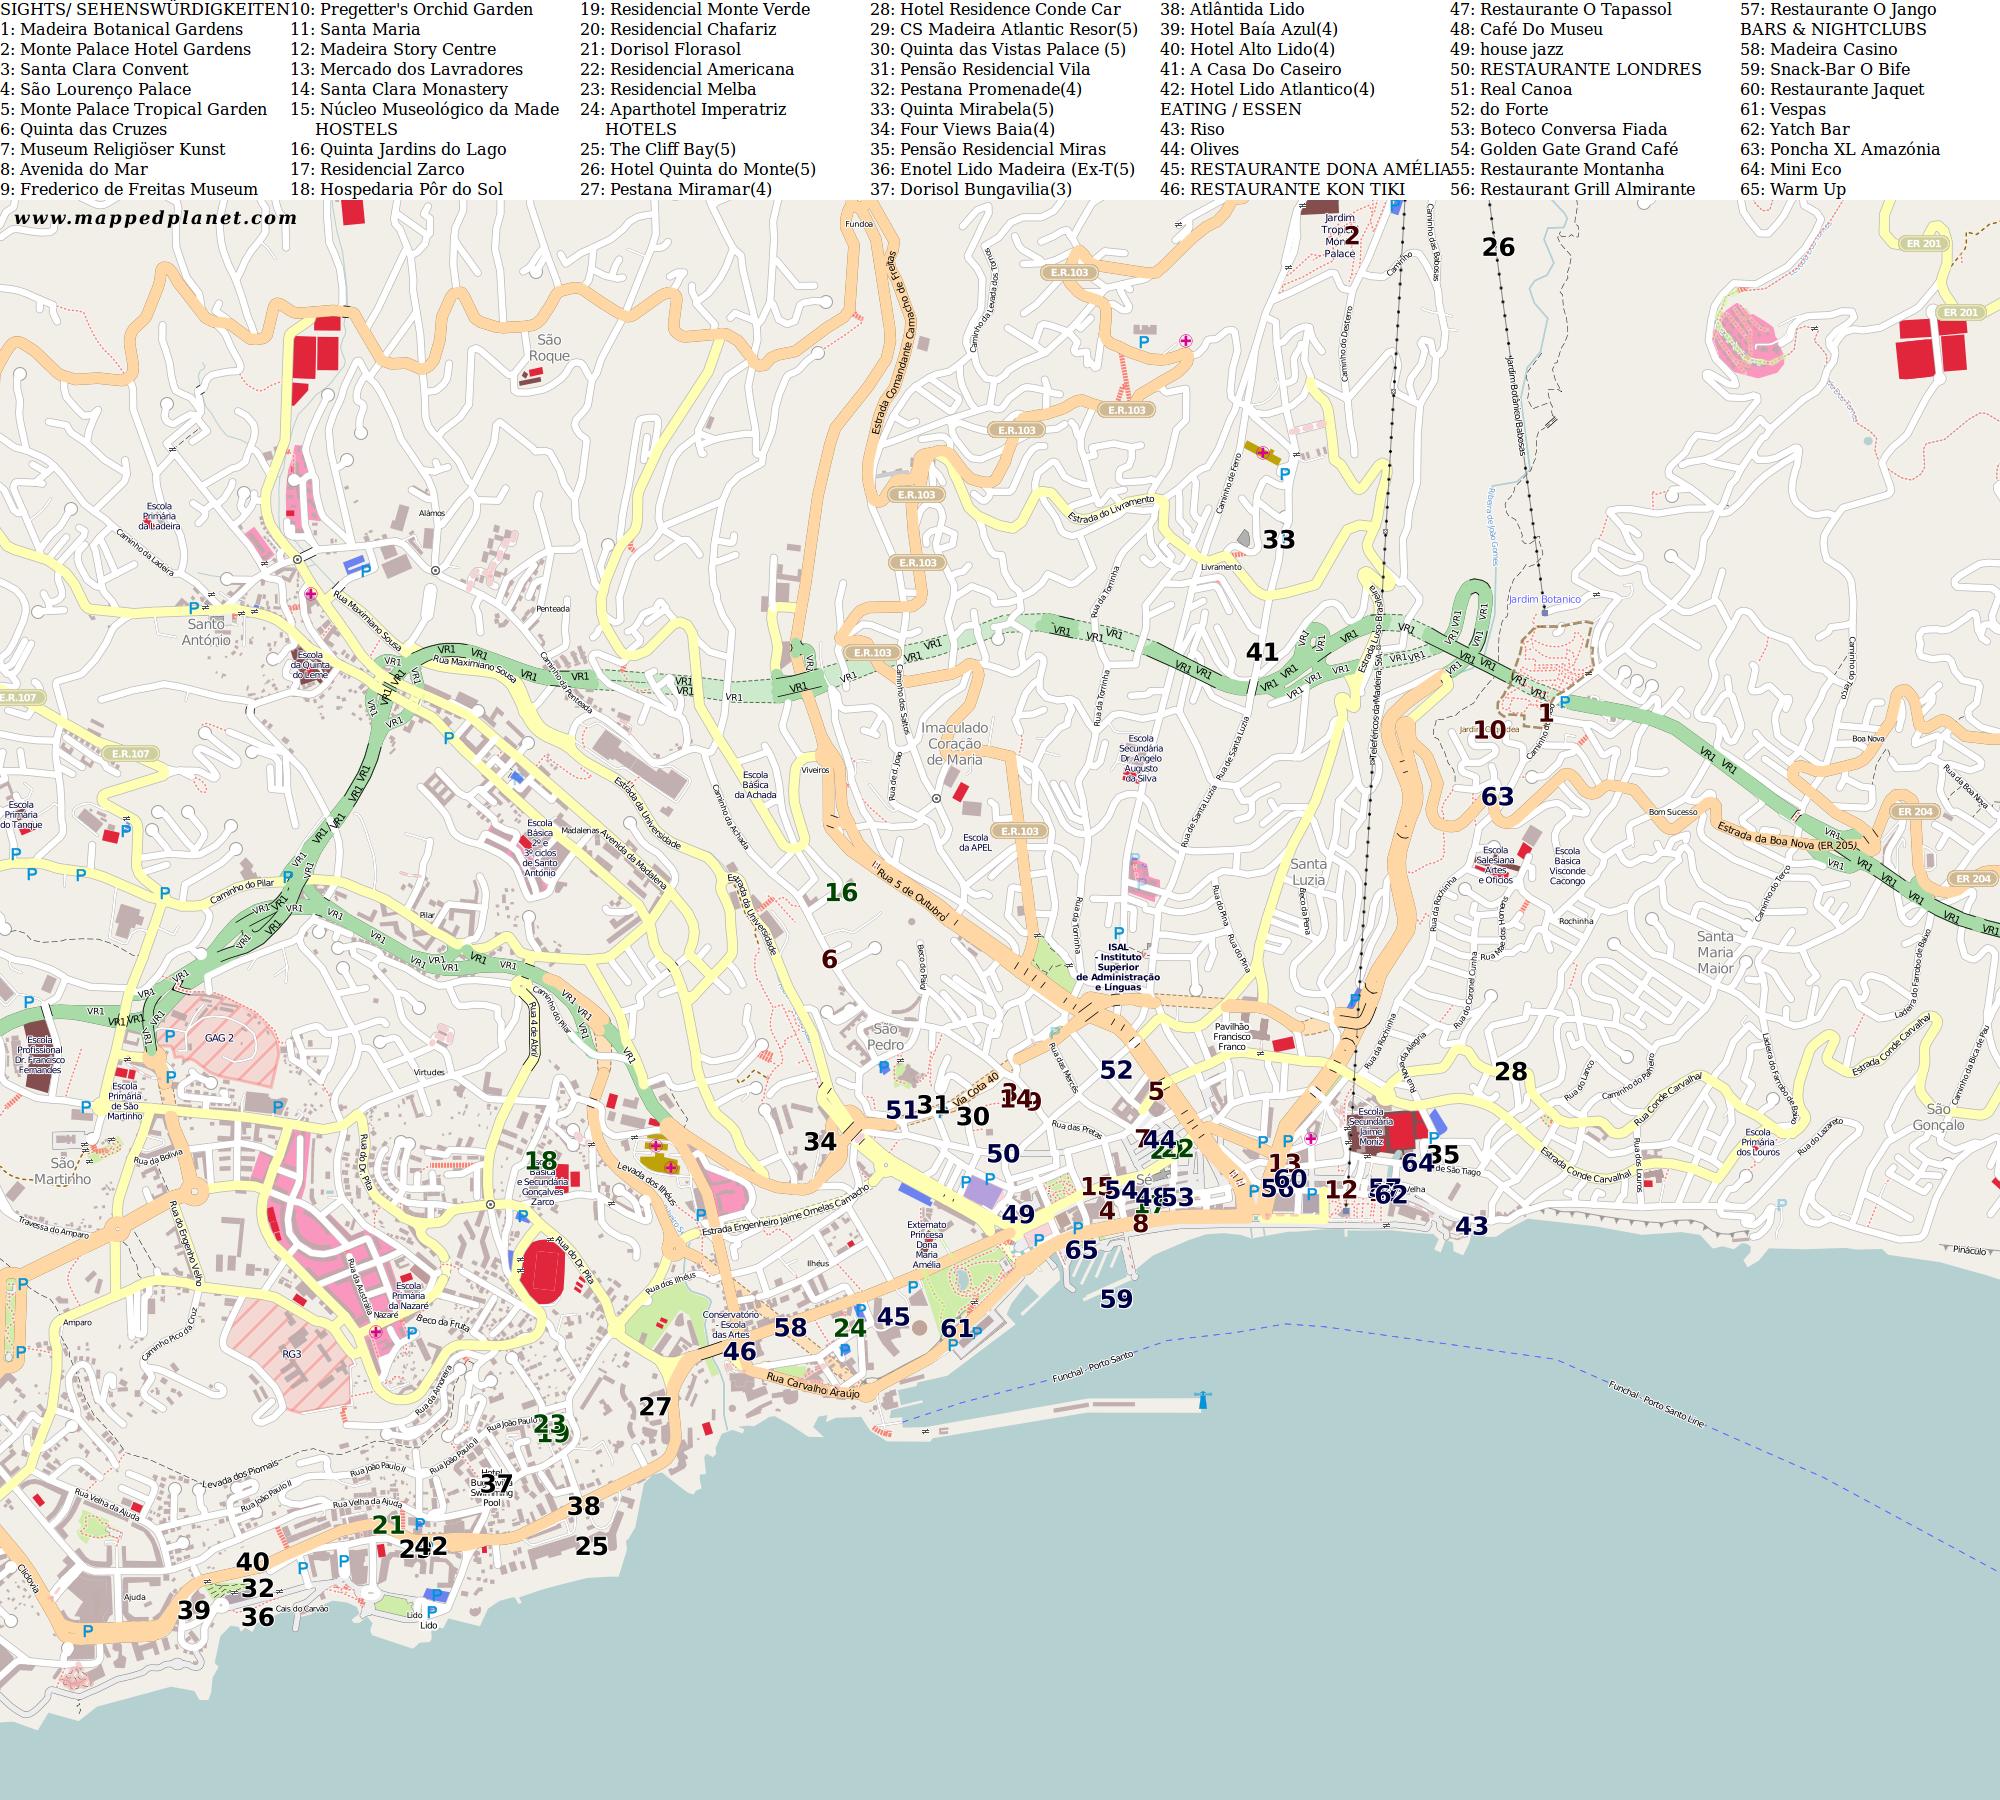 Funchal karte funchal karte hafenhandbuch spanien marina for Kisseo geburtstag kostenlos